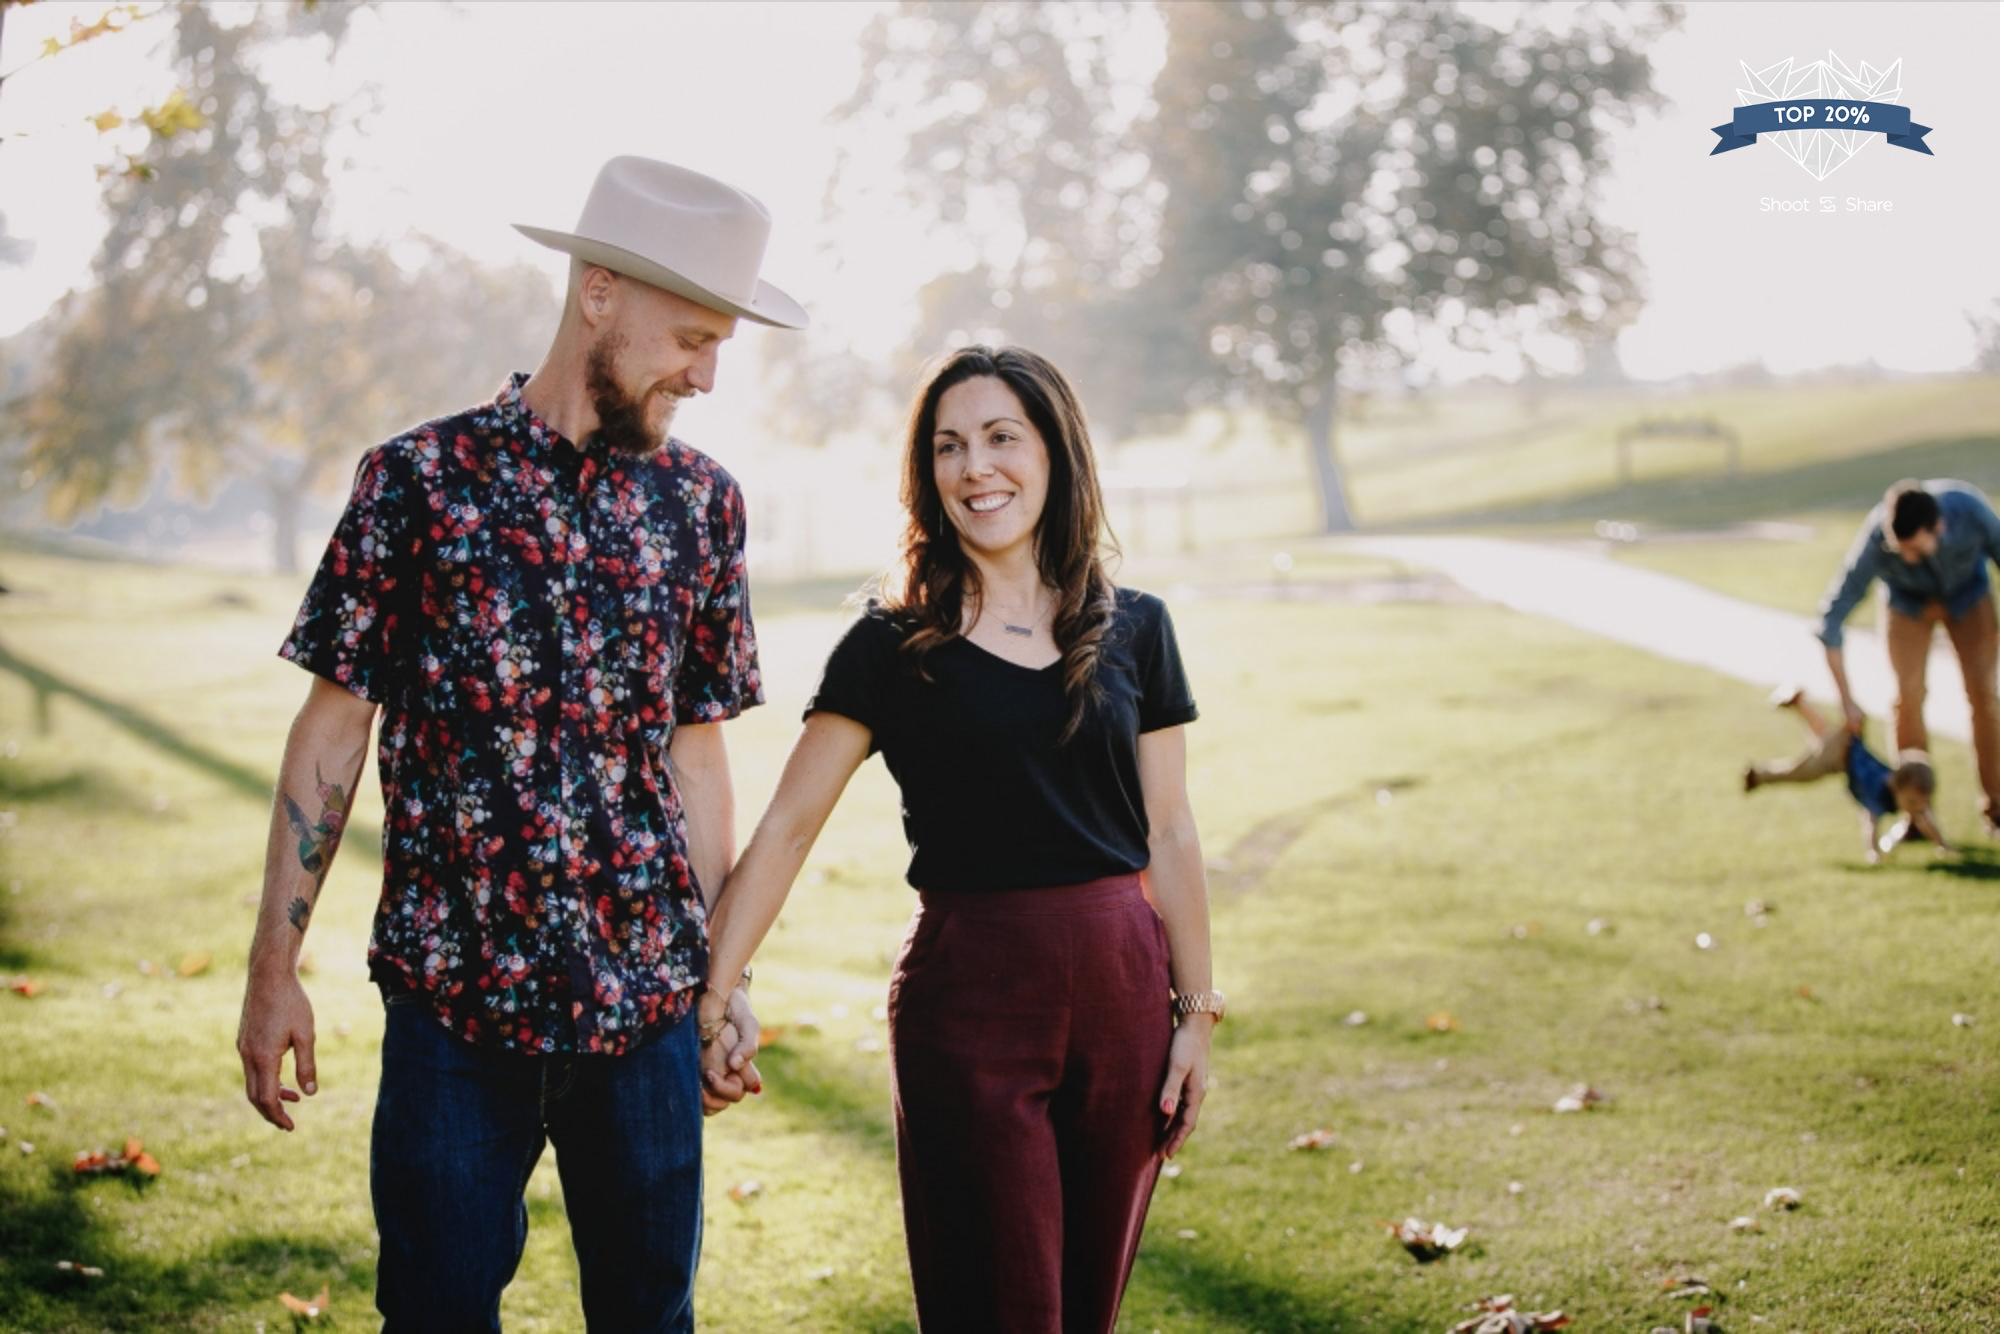 Archer Inspired Photography Shoot and Share Family Wedding Lifestyle Photographer Morgan Hill California San Francisco Bay Area-27.jpg